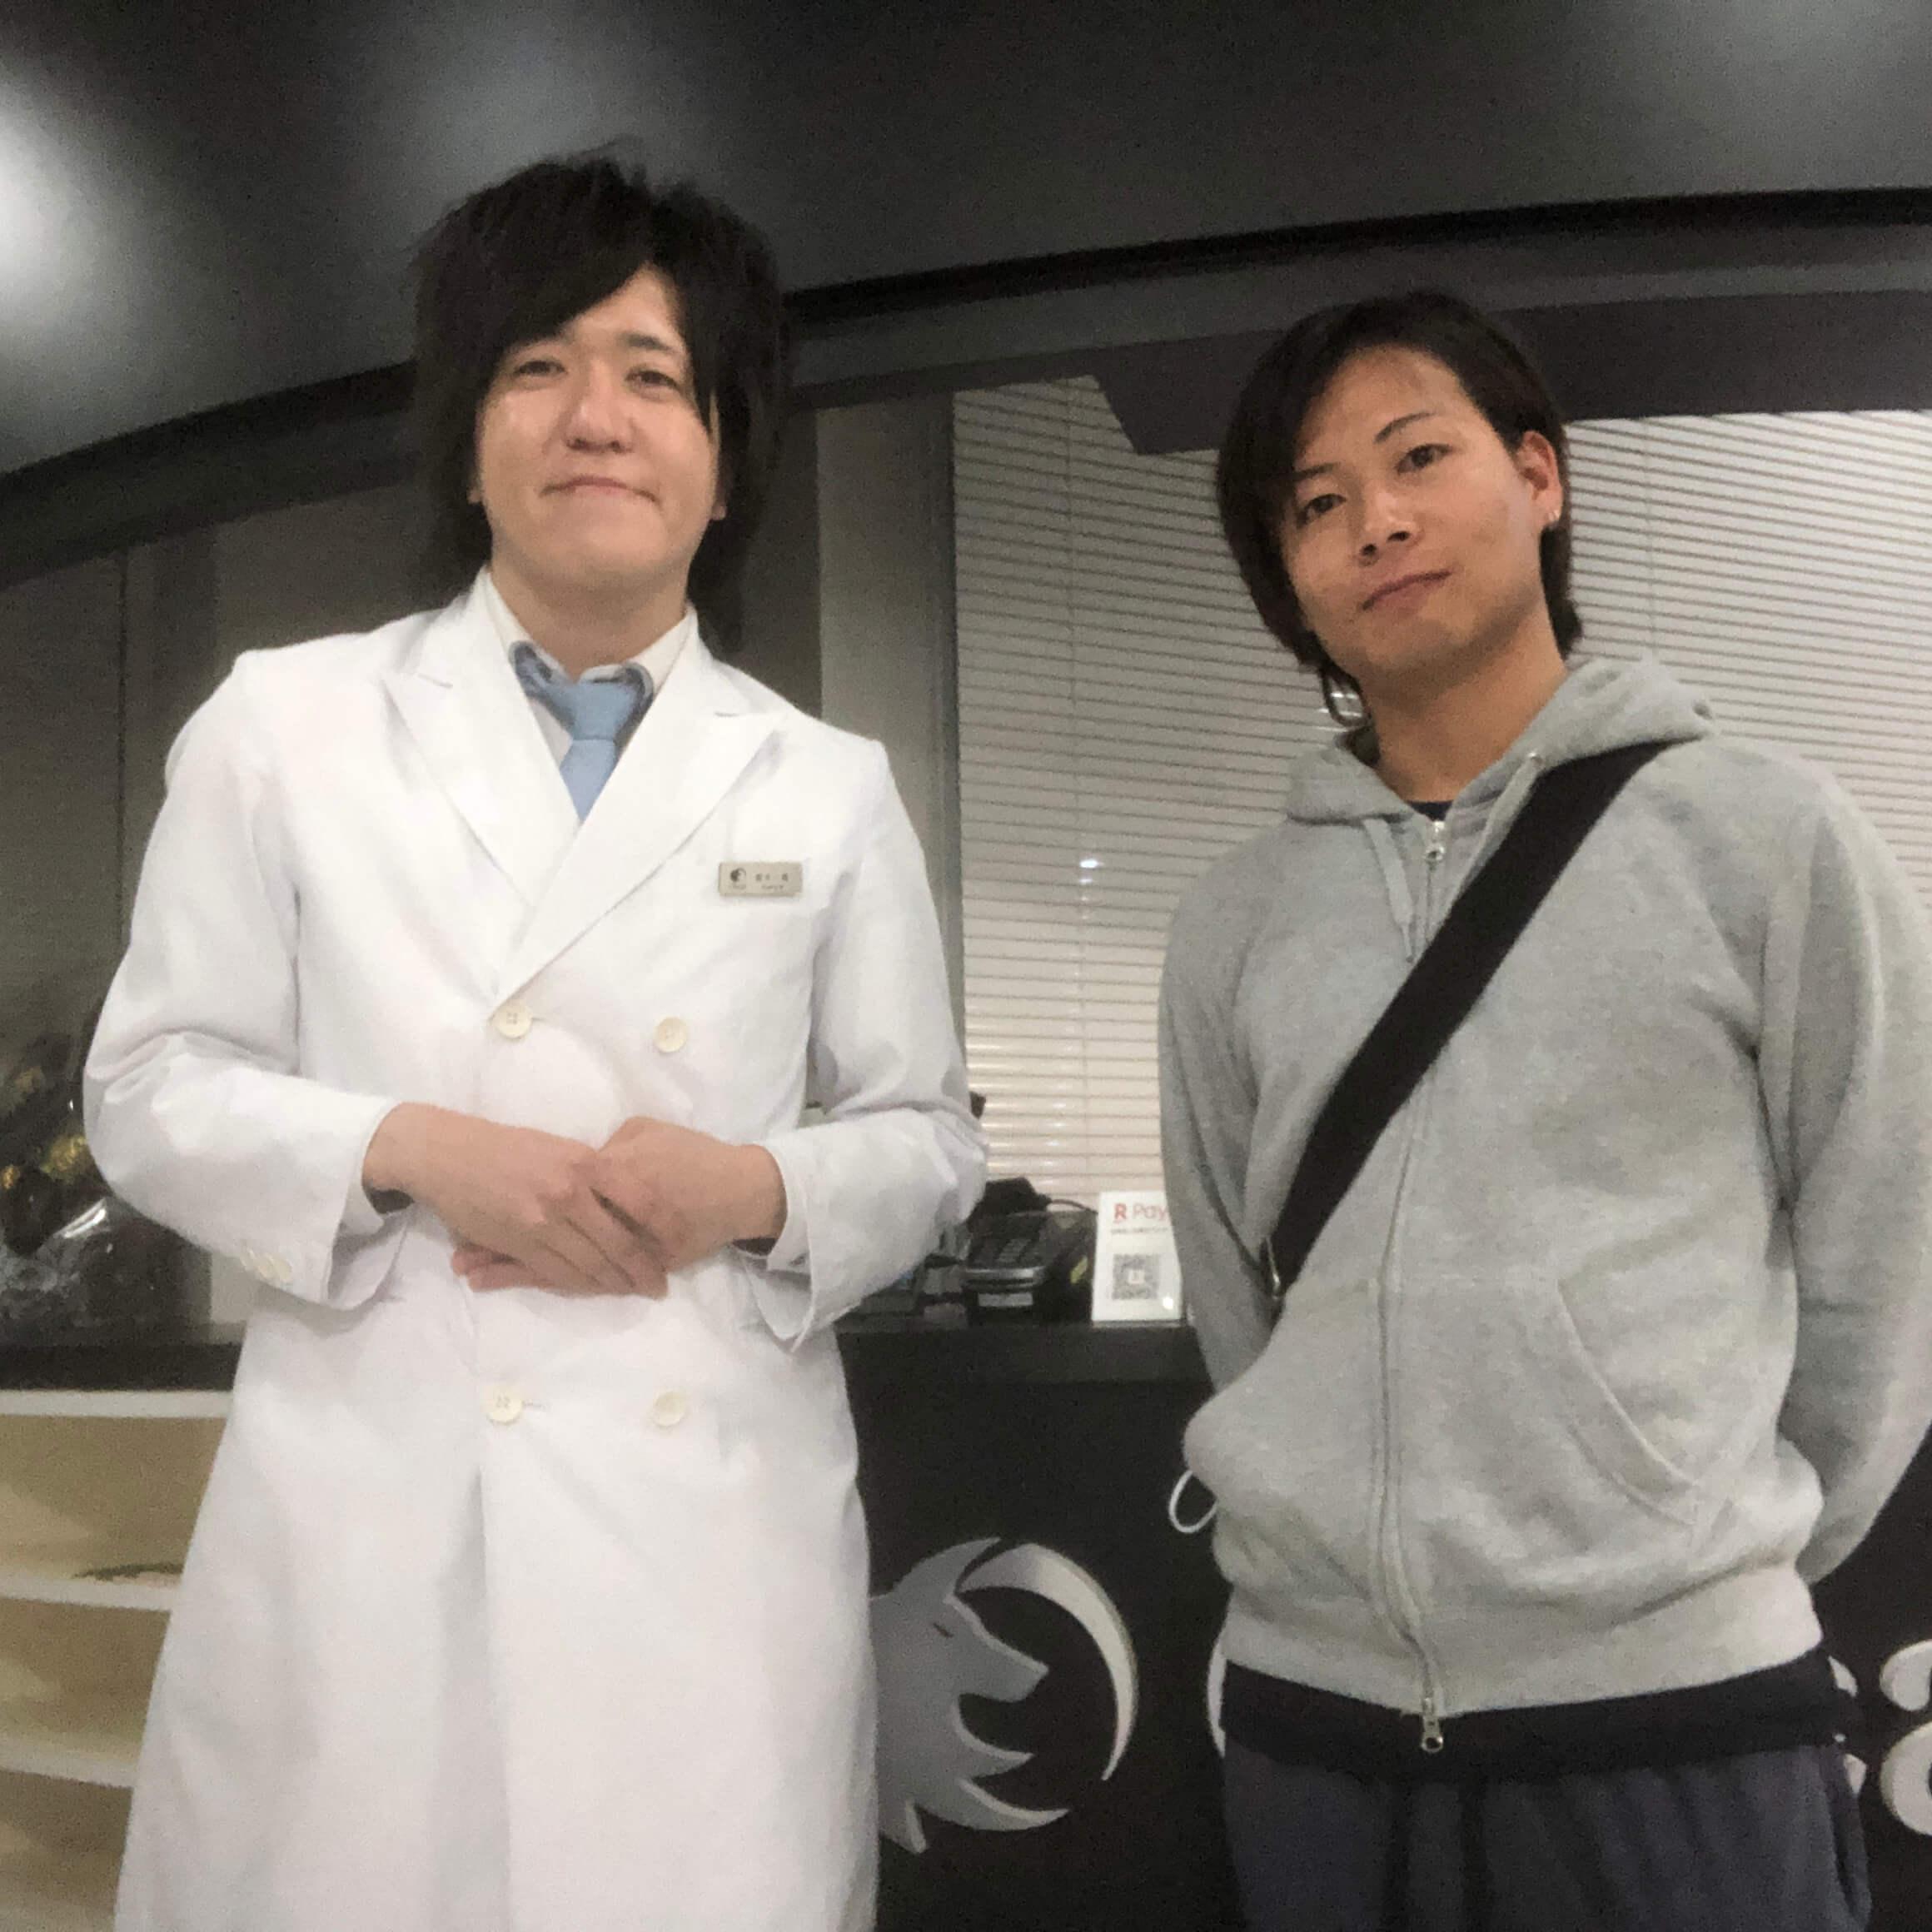 名古屋 K・T様 23歳営業 全身脱毛(ヒゲ脱毛・VIO脱毛)